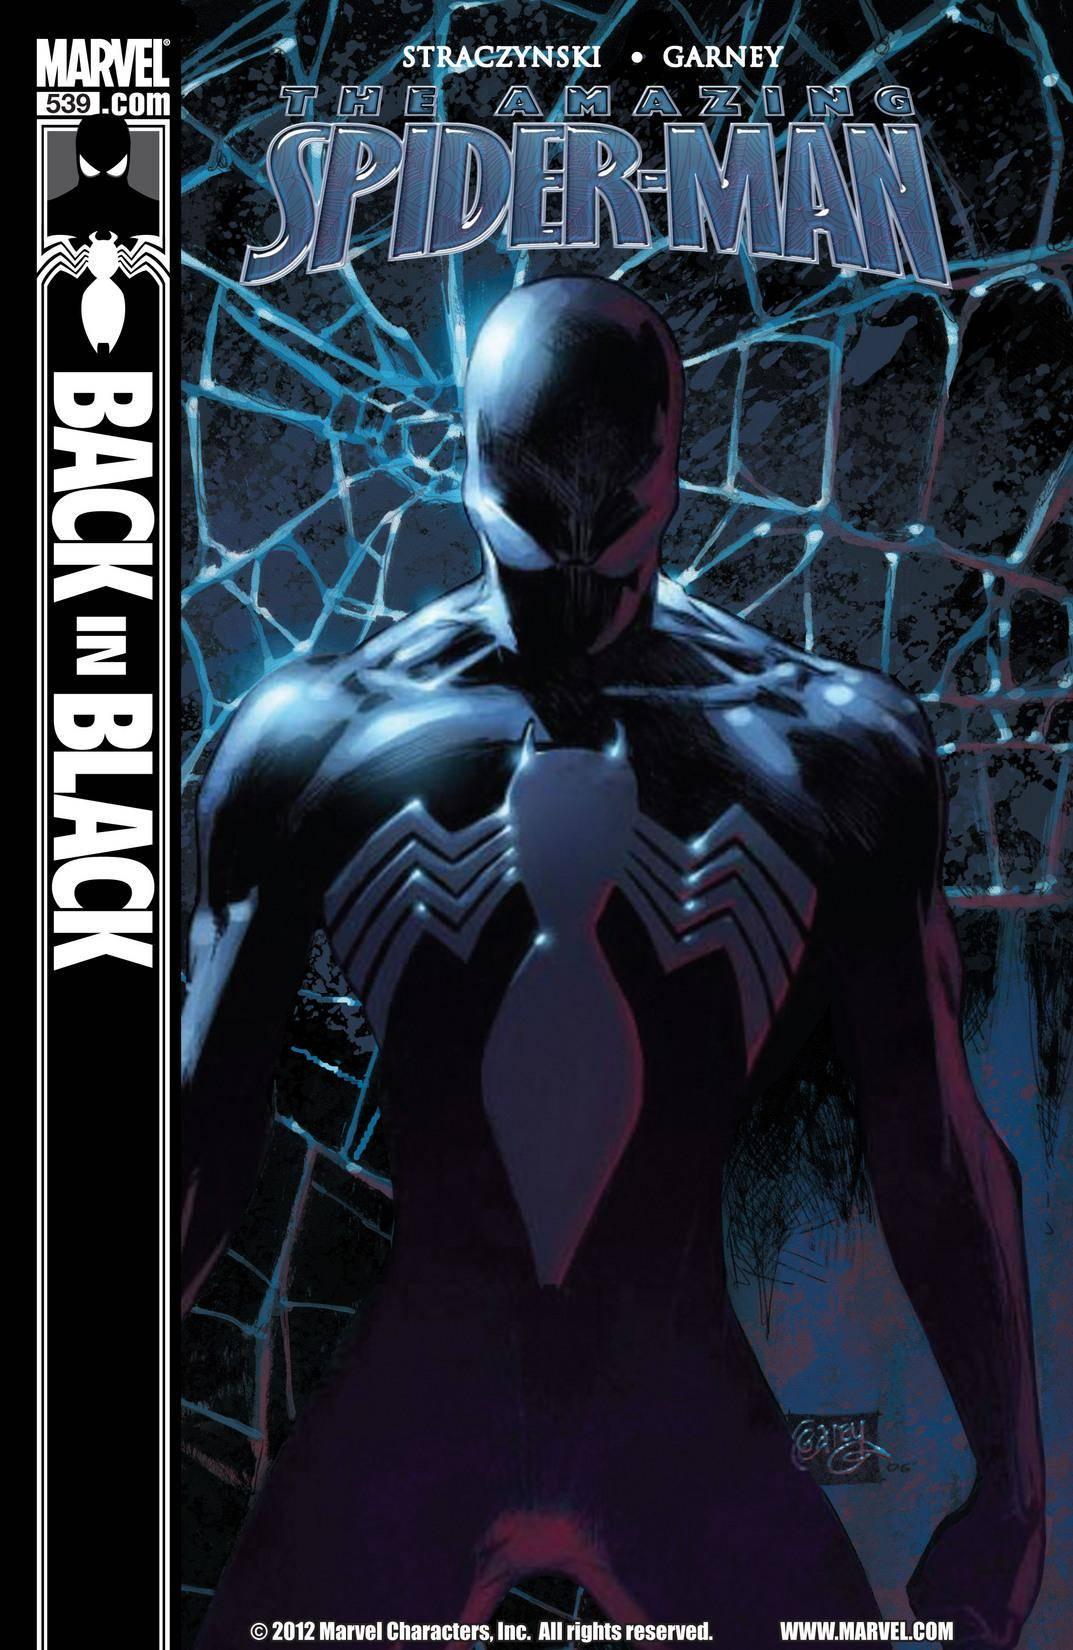 Amazing Spider-Man 539 2007 digital